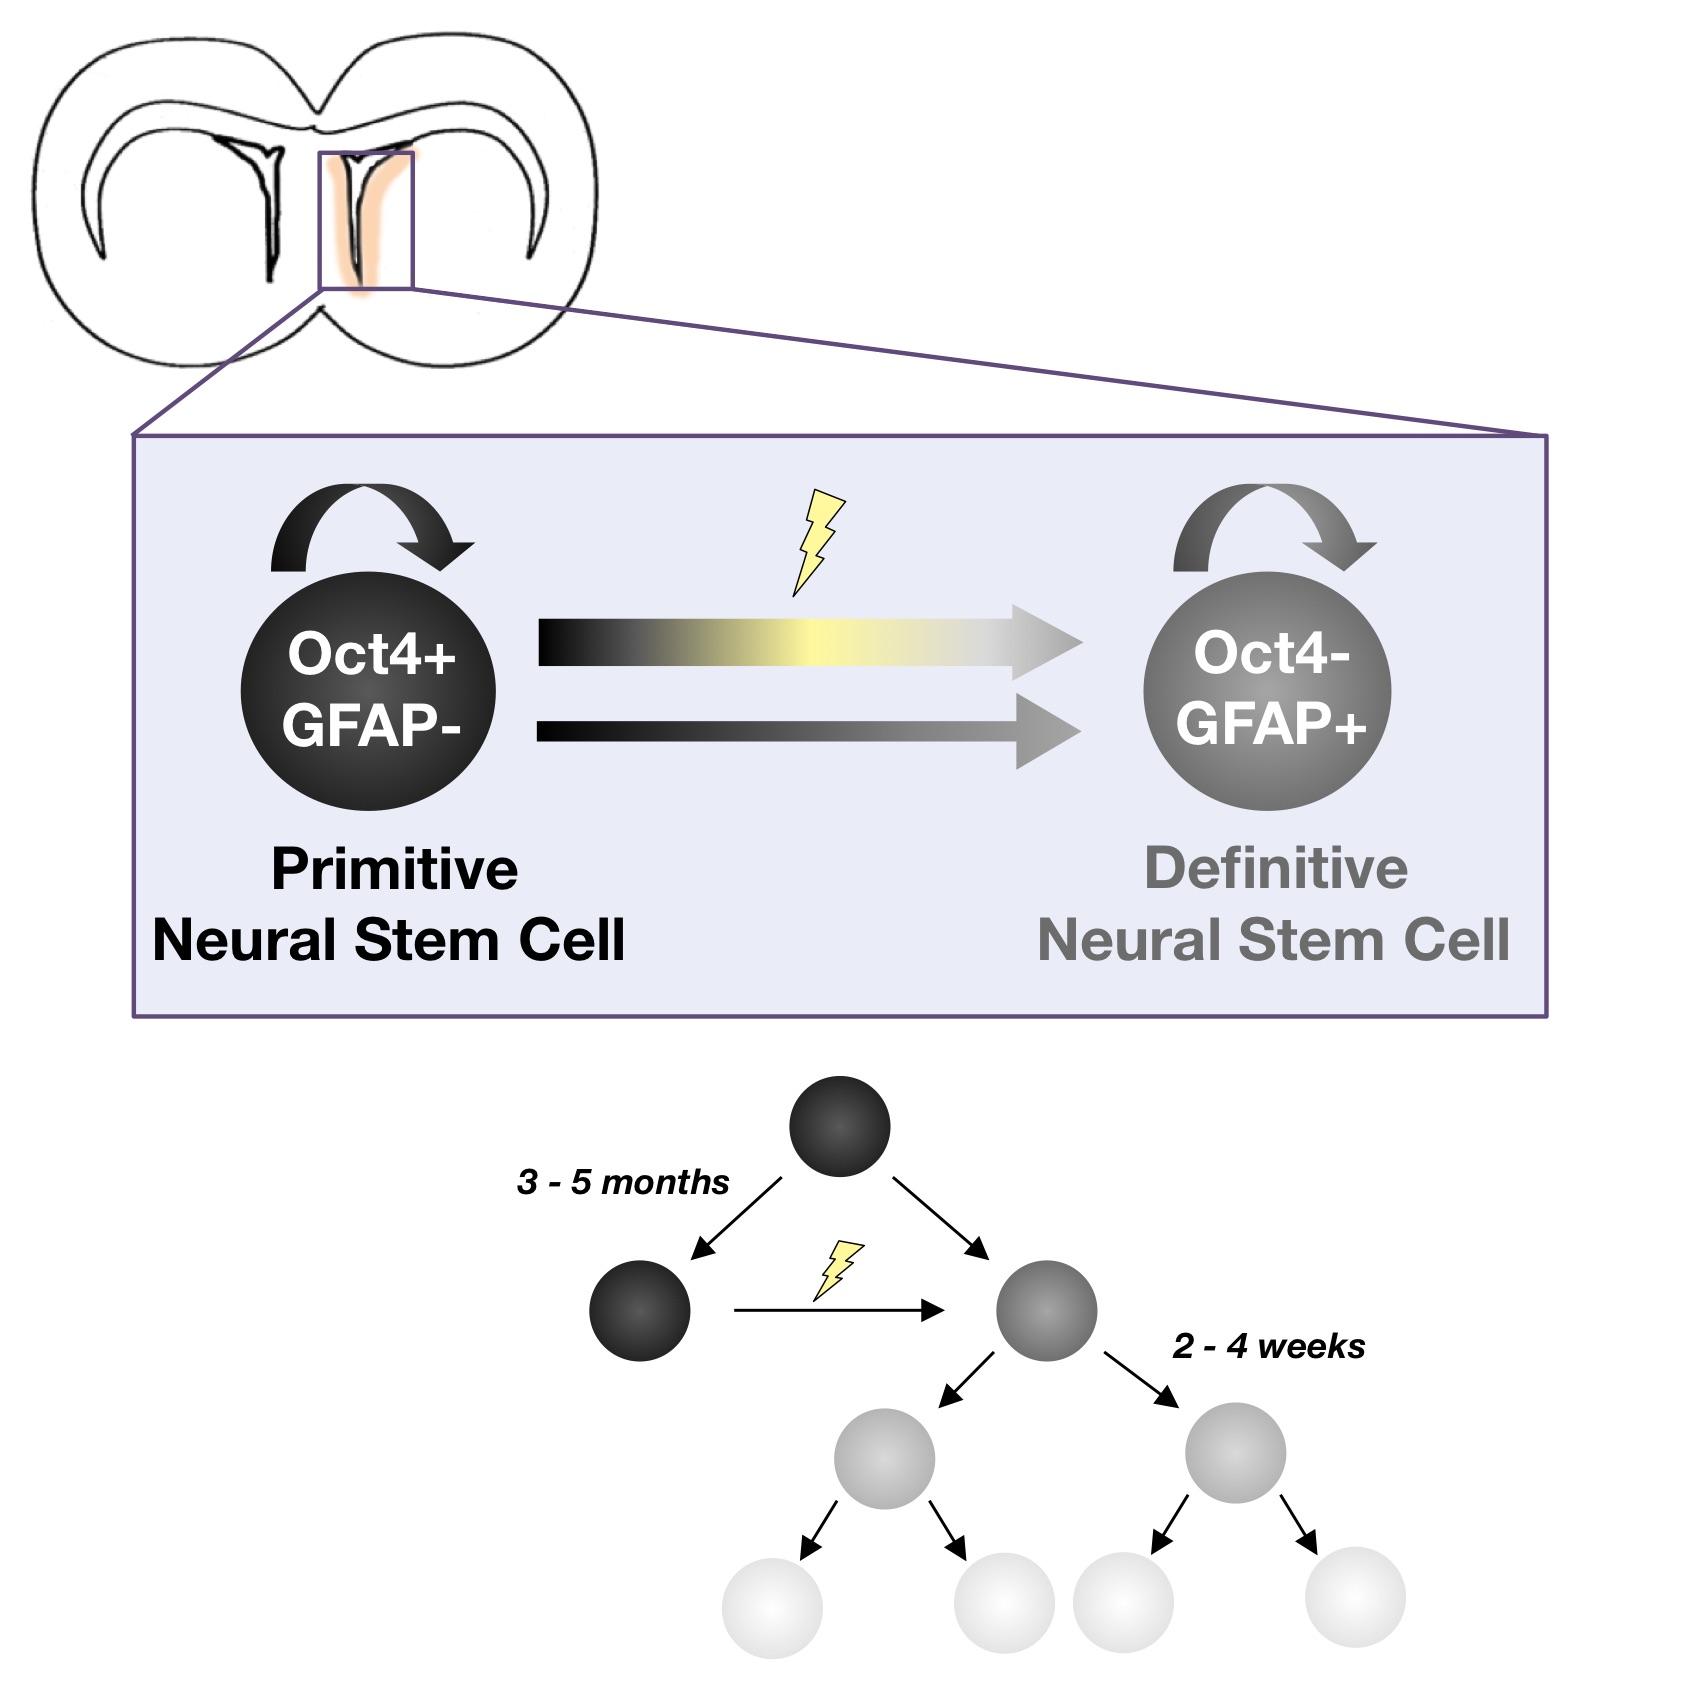 Quiescent Oct4+ Neural Stem Cells (NSCs) Repopulate Ablated Glial Fibrillary Acidic Protein+ NSCs in the Adult Mouse Brain - Rachel L. Reeve, Samantha Z. Yammine, Cindi M. Morshead, Derek van der Kooy.Stem Cells